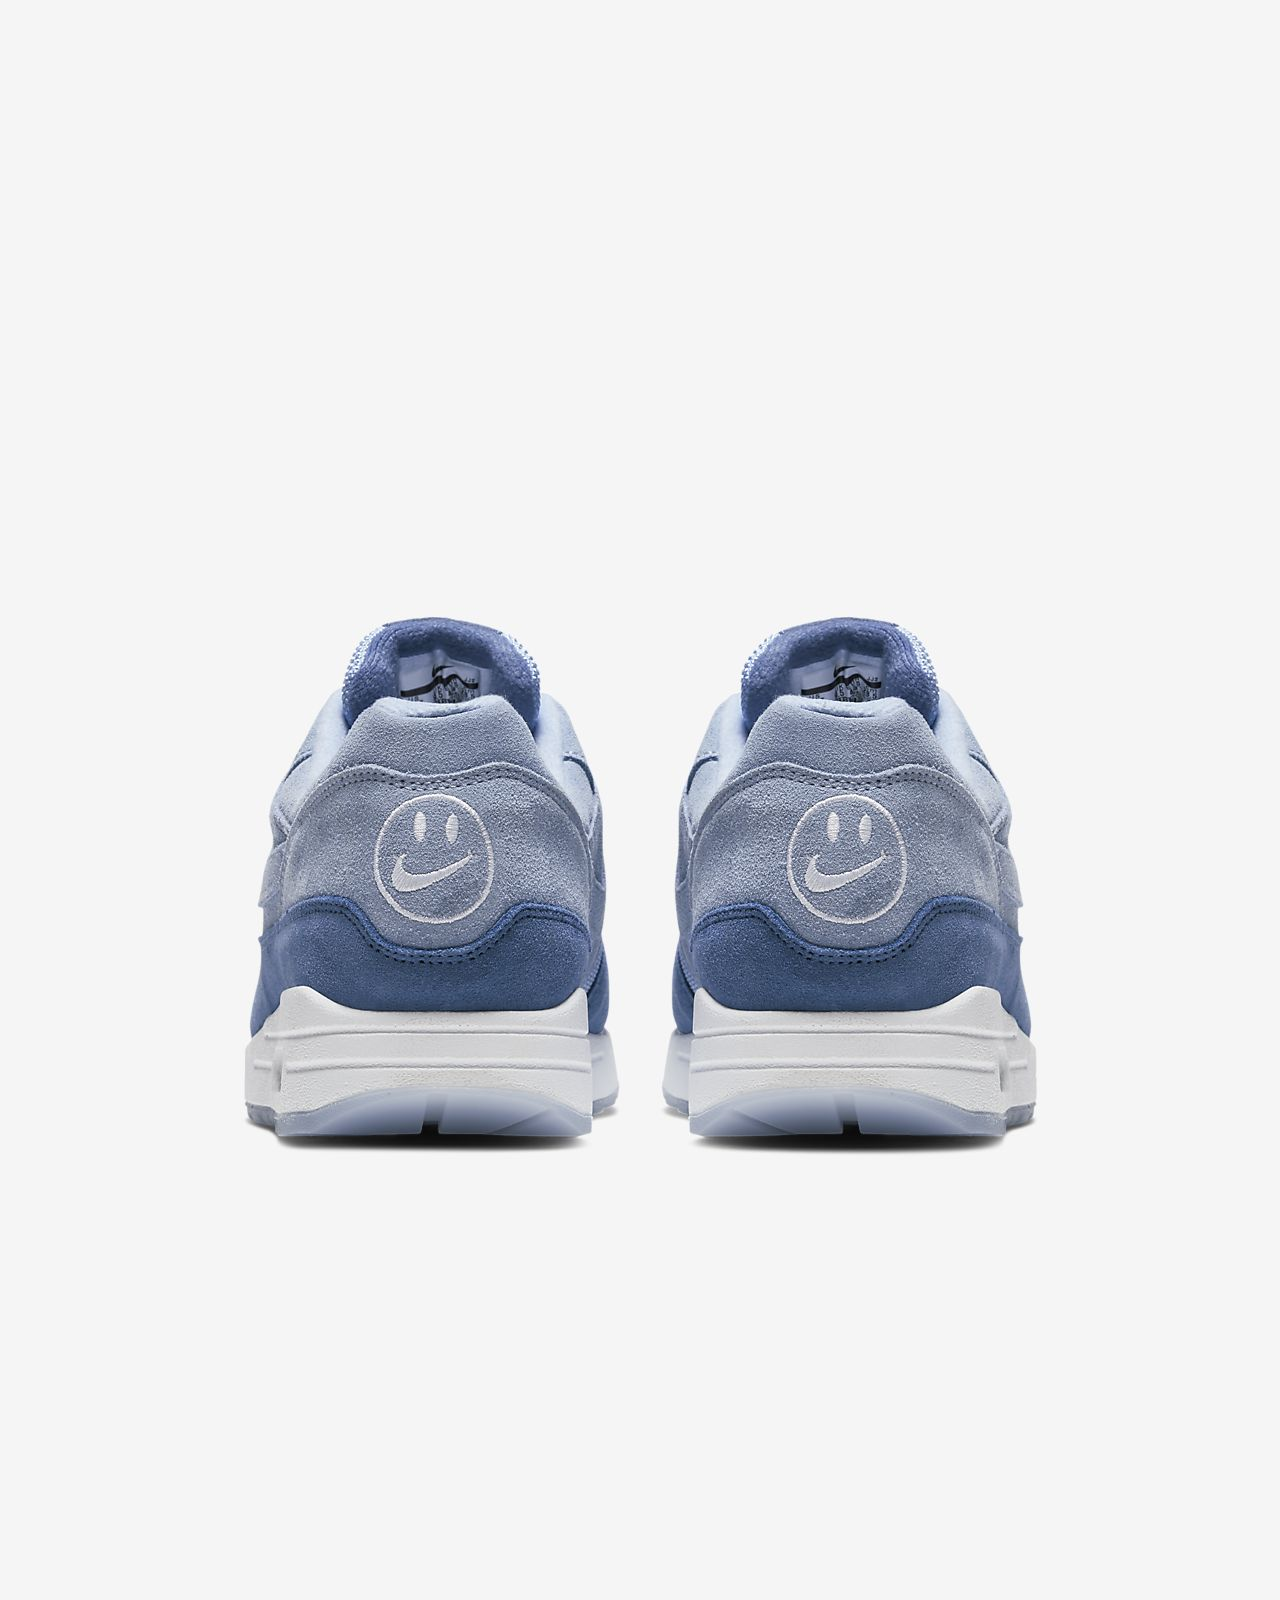 quality design 7134b 597b3 ... Nike Air Max 1 ND Men s Shoe